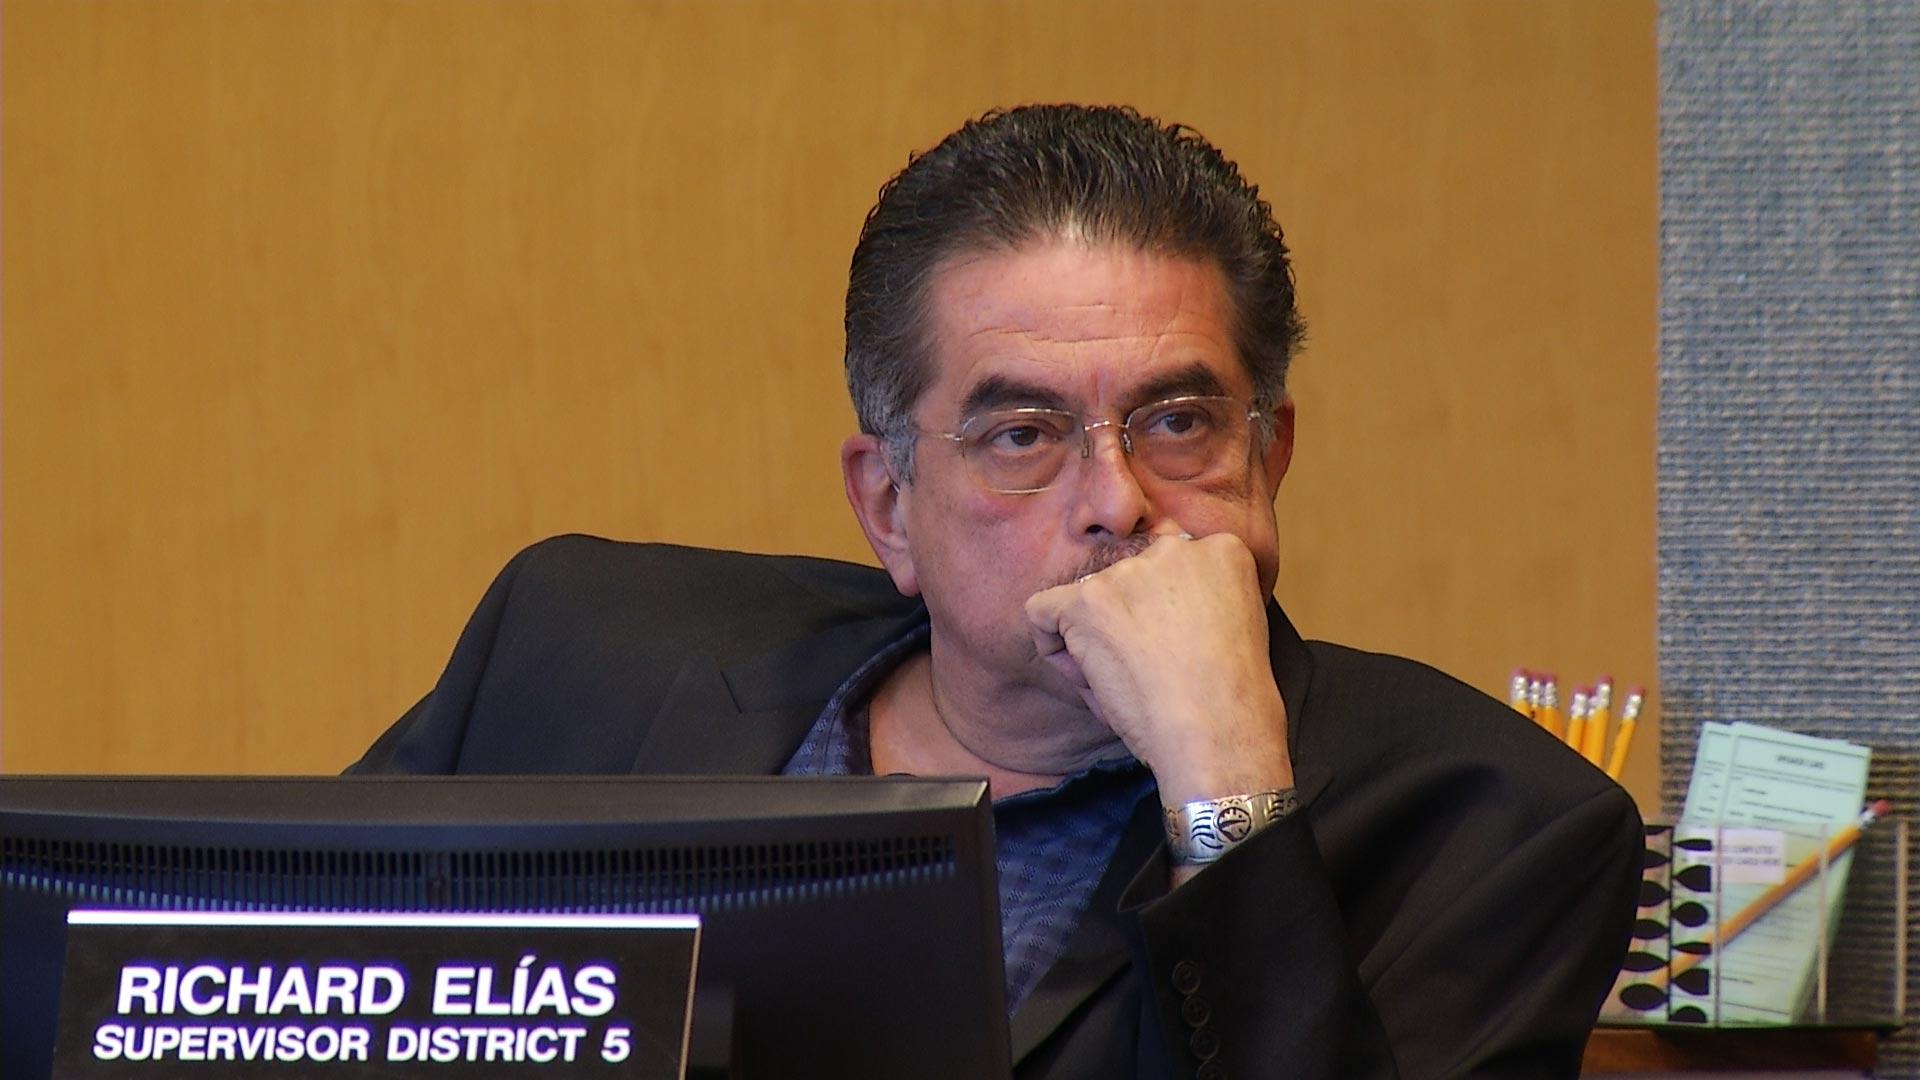 Richard Elias spot